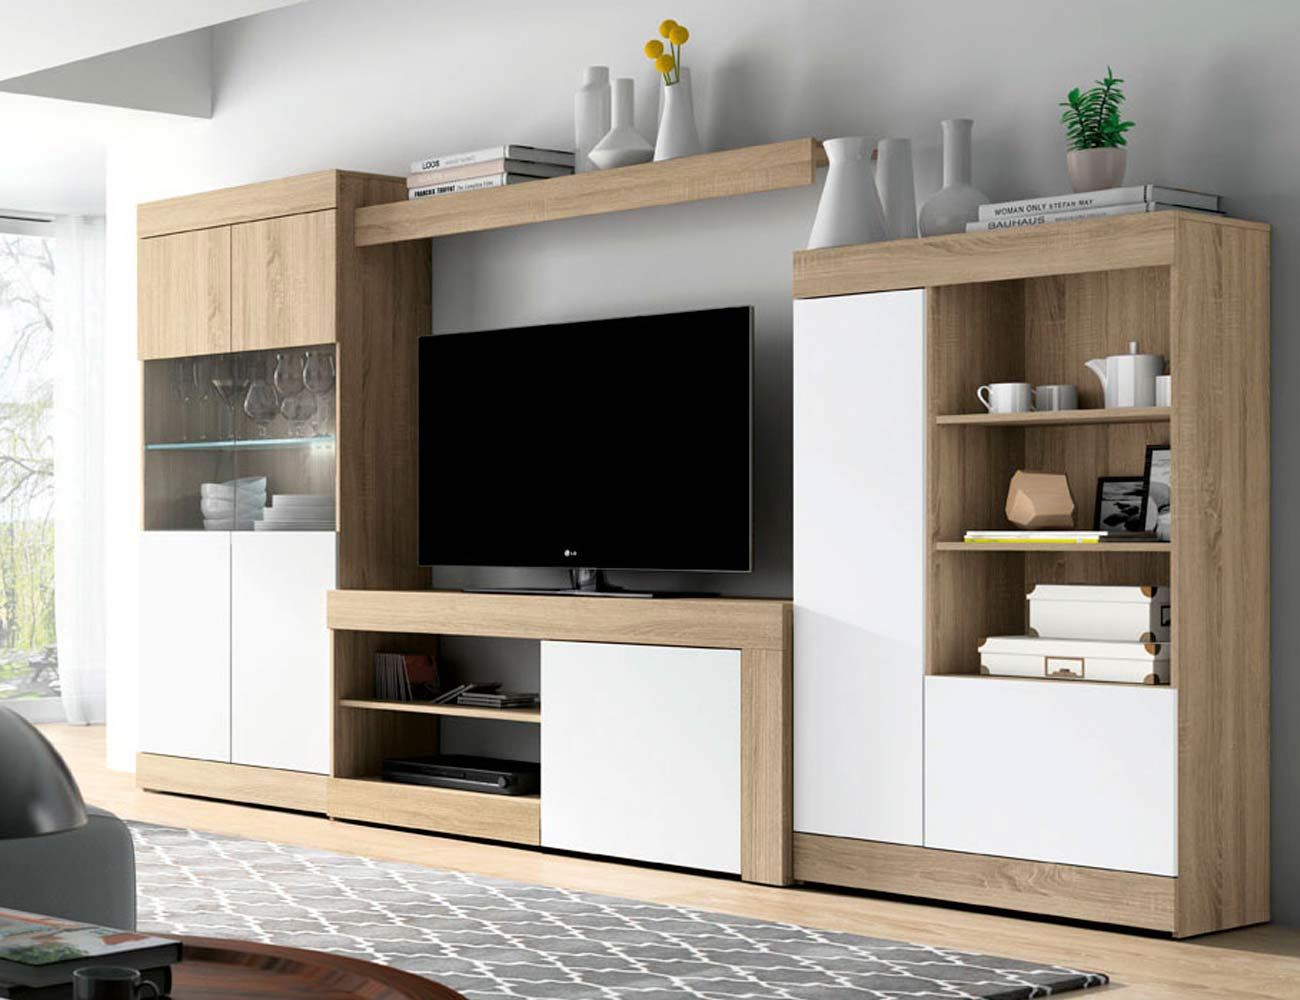 Mueble salon moderno leds ambiente 4